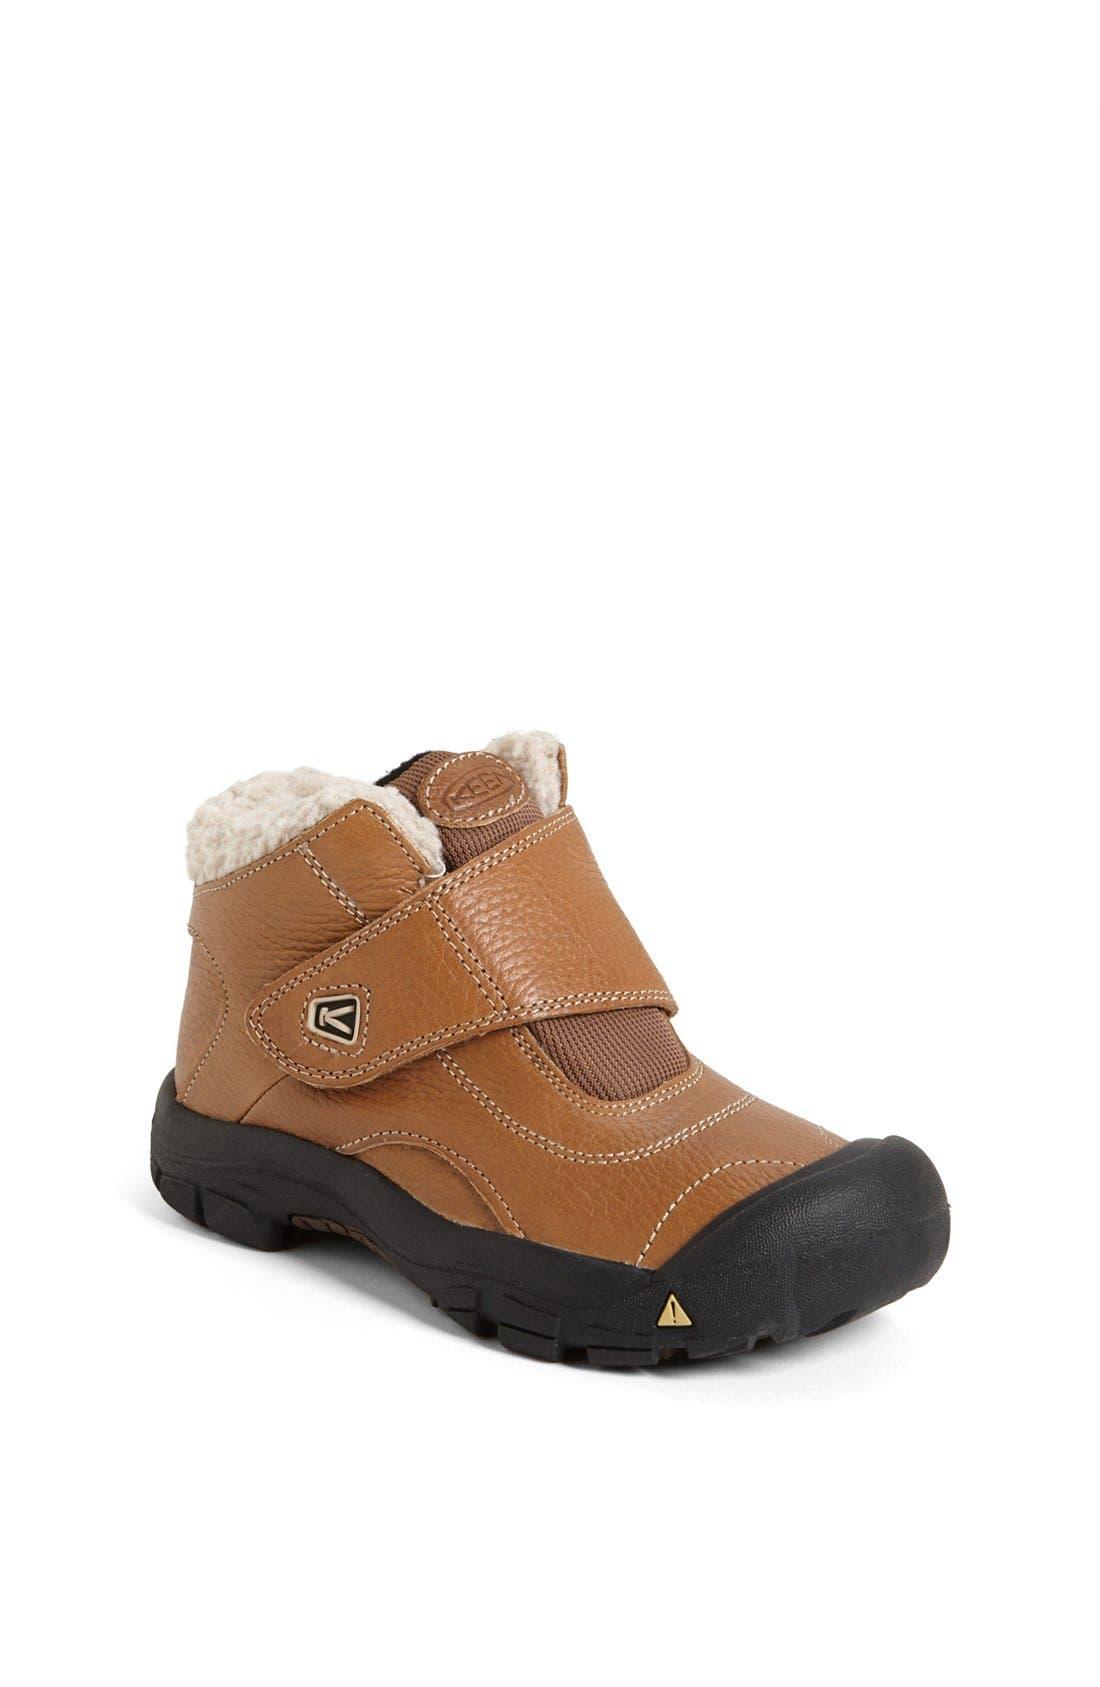 Main Image - Keen 'Kootenay' Boot (Baby, Walker, Toddler & Little Kid)